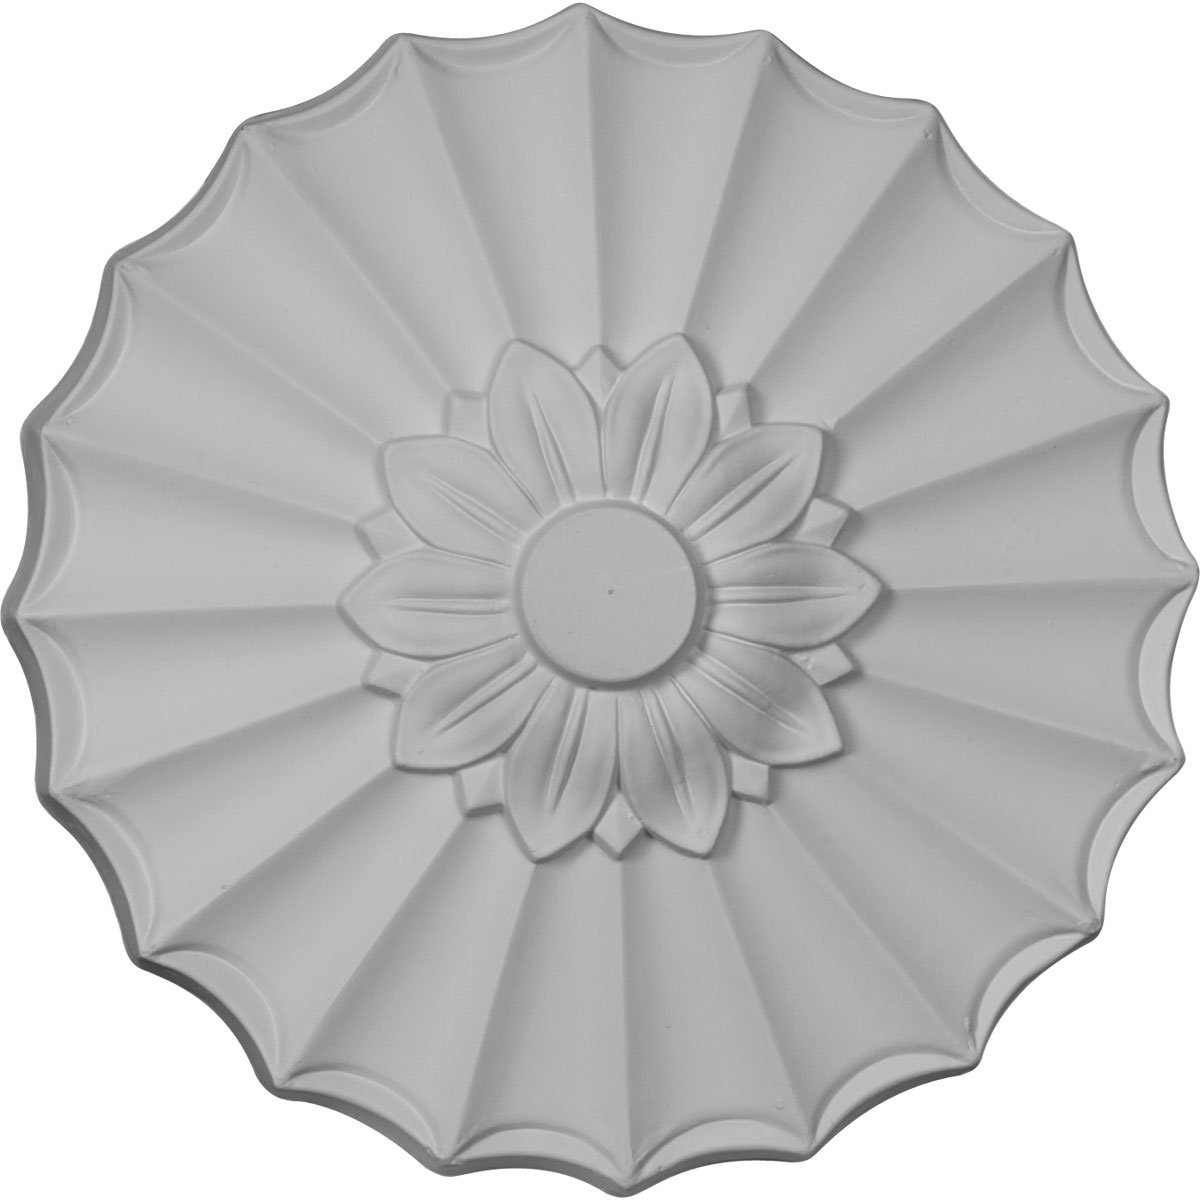 Ekena Millwork CM09SH 9-Inch OD x 1 3/8-Inch Shakuras Ceiling Medallion